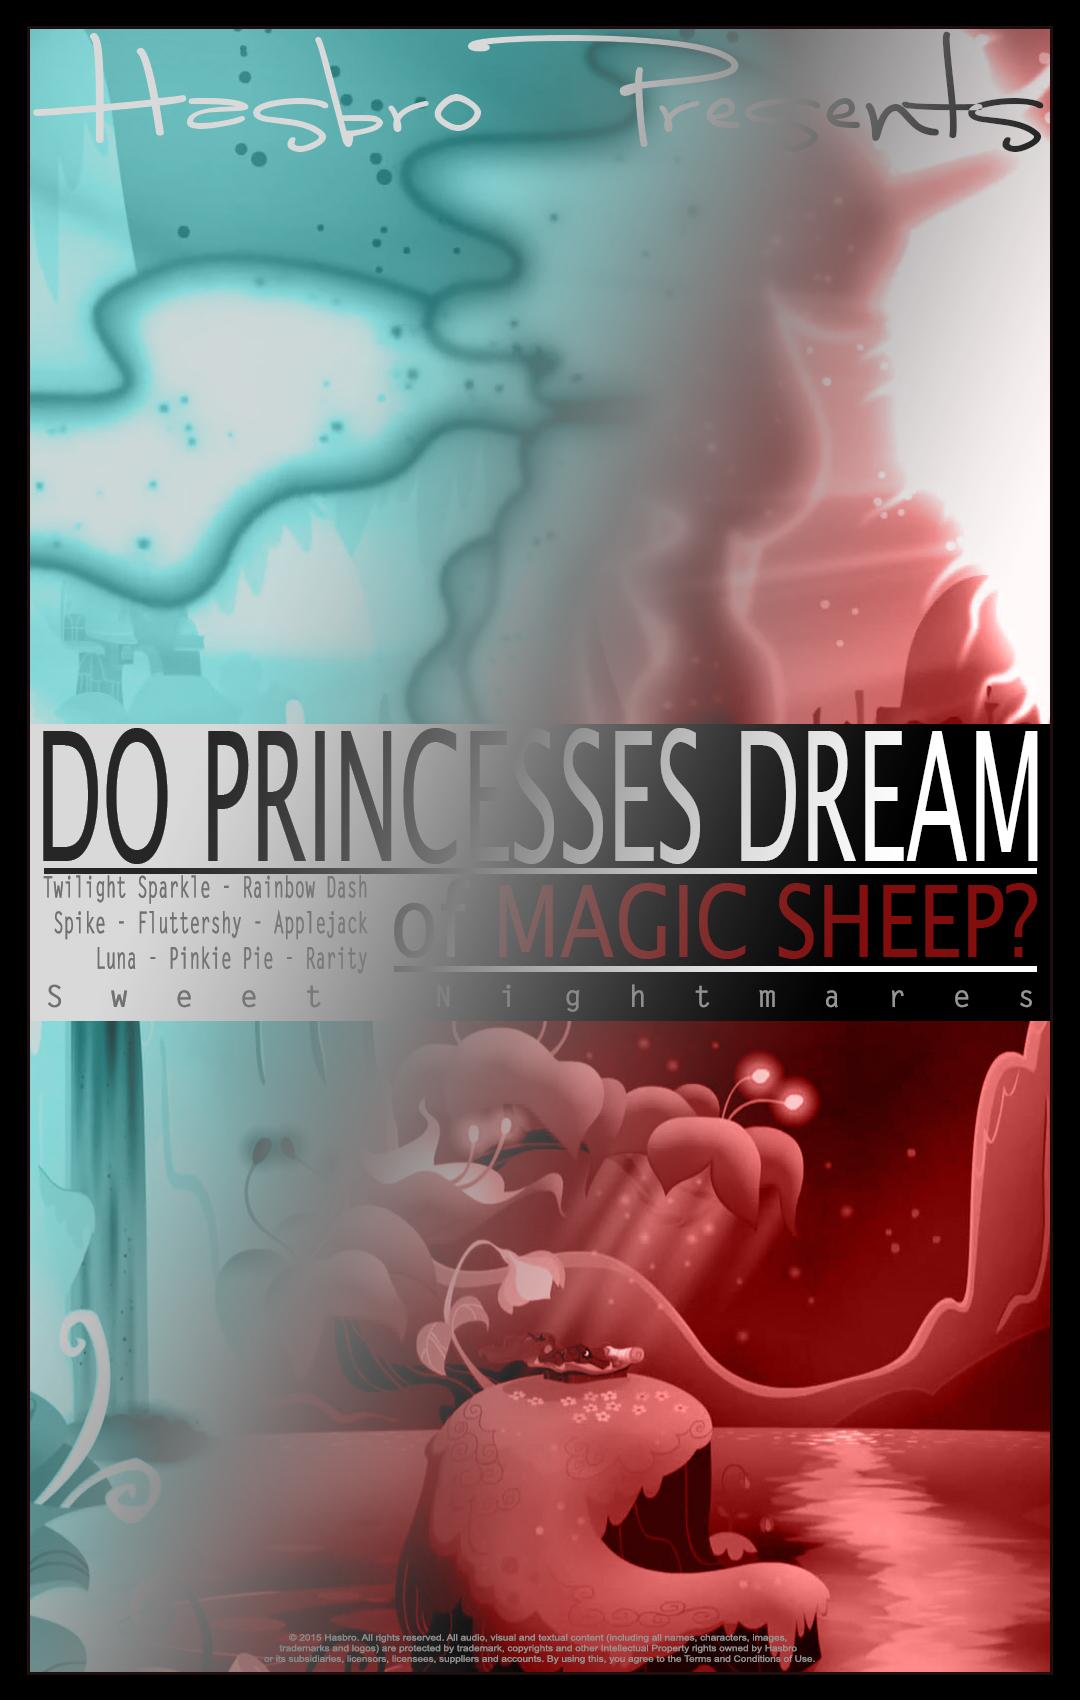 mlp_do_princesses_dream_of_magic_sheep_movieposter_by_pims1978-d90yg3f.jpg